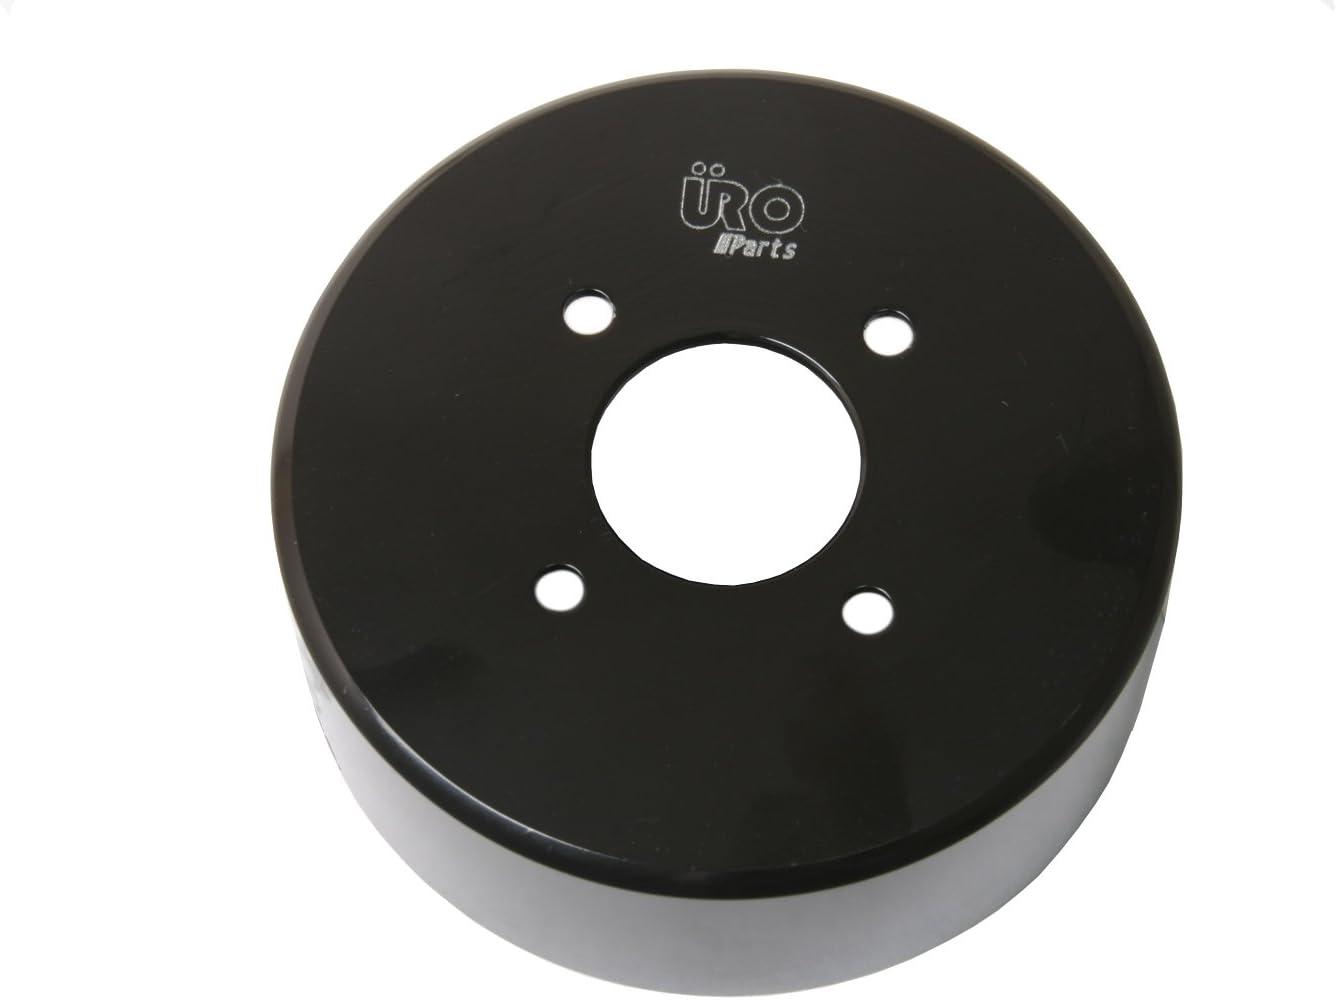 URO Parts 1122020110 Water Pump Pulley